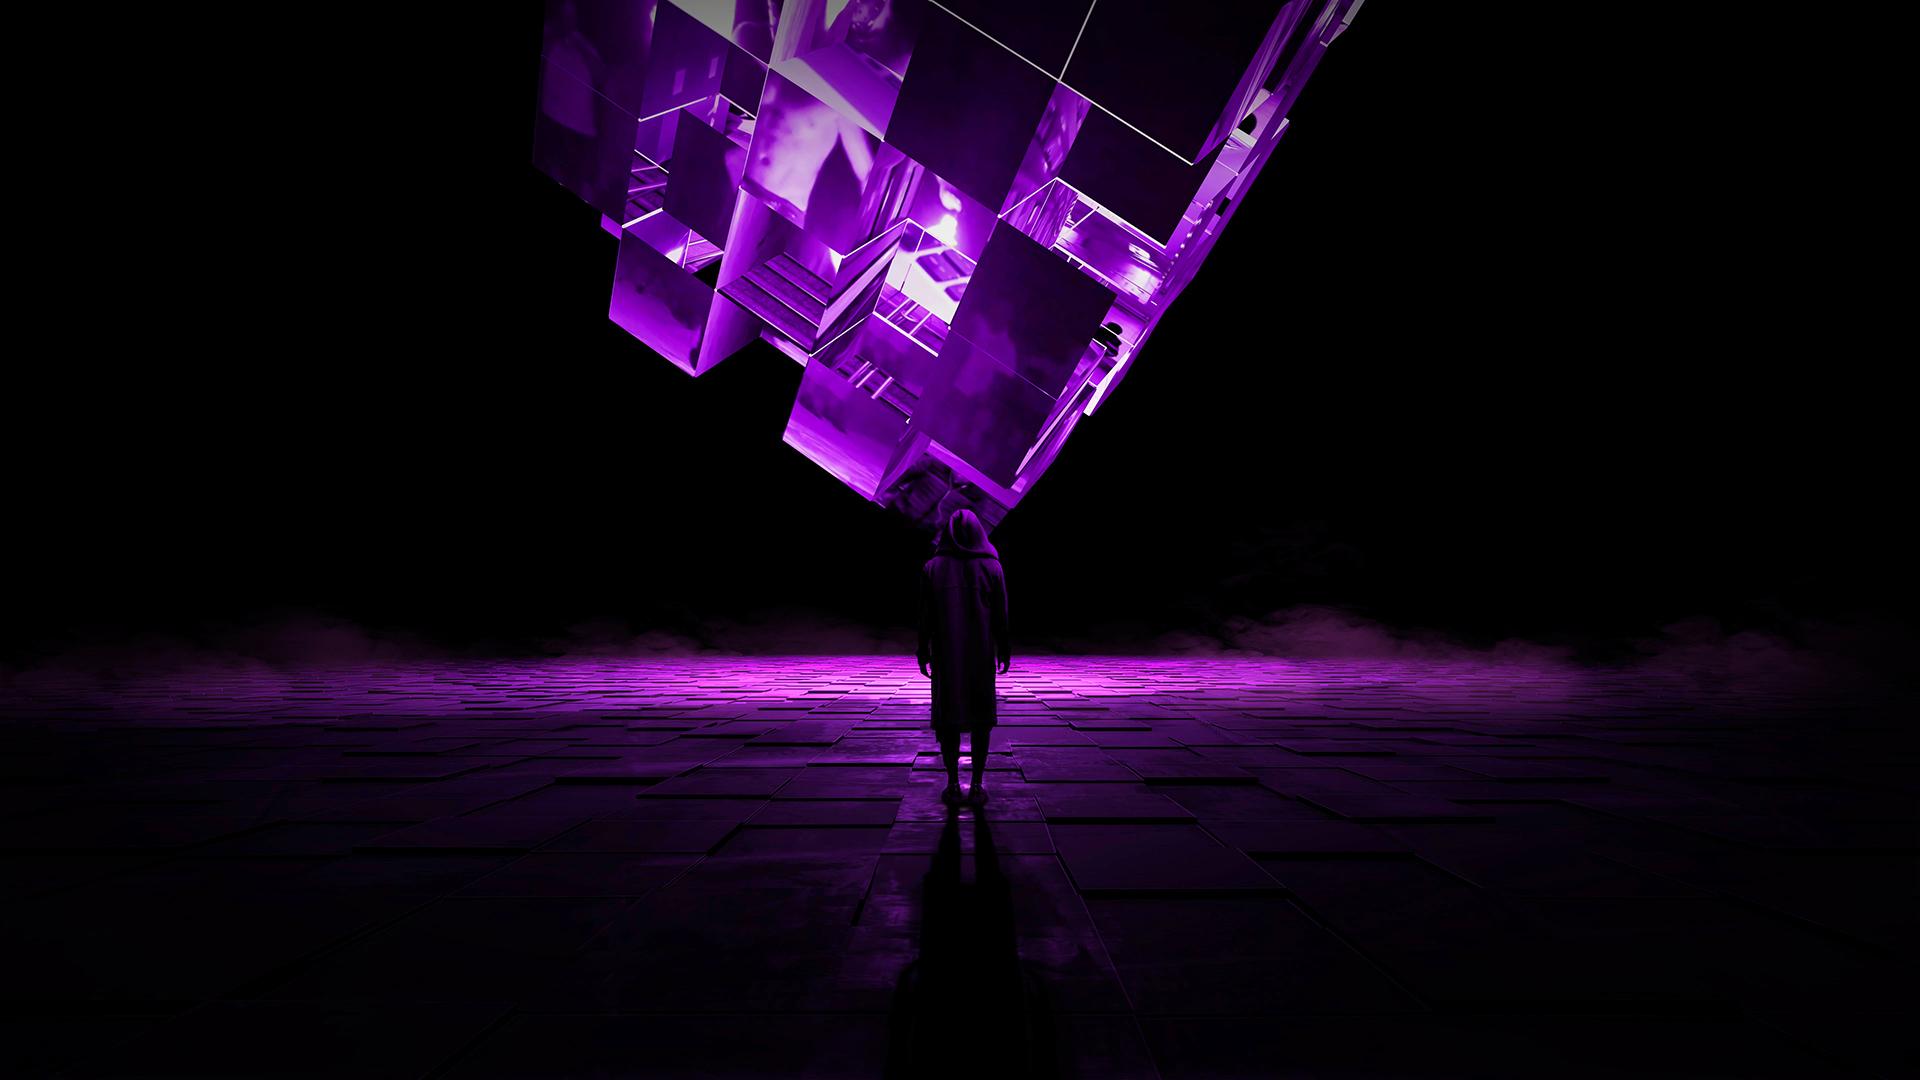 introspexion-visual-the-deja-vu-factory-gate22-museum-digital-art-design-in-virtual-reality